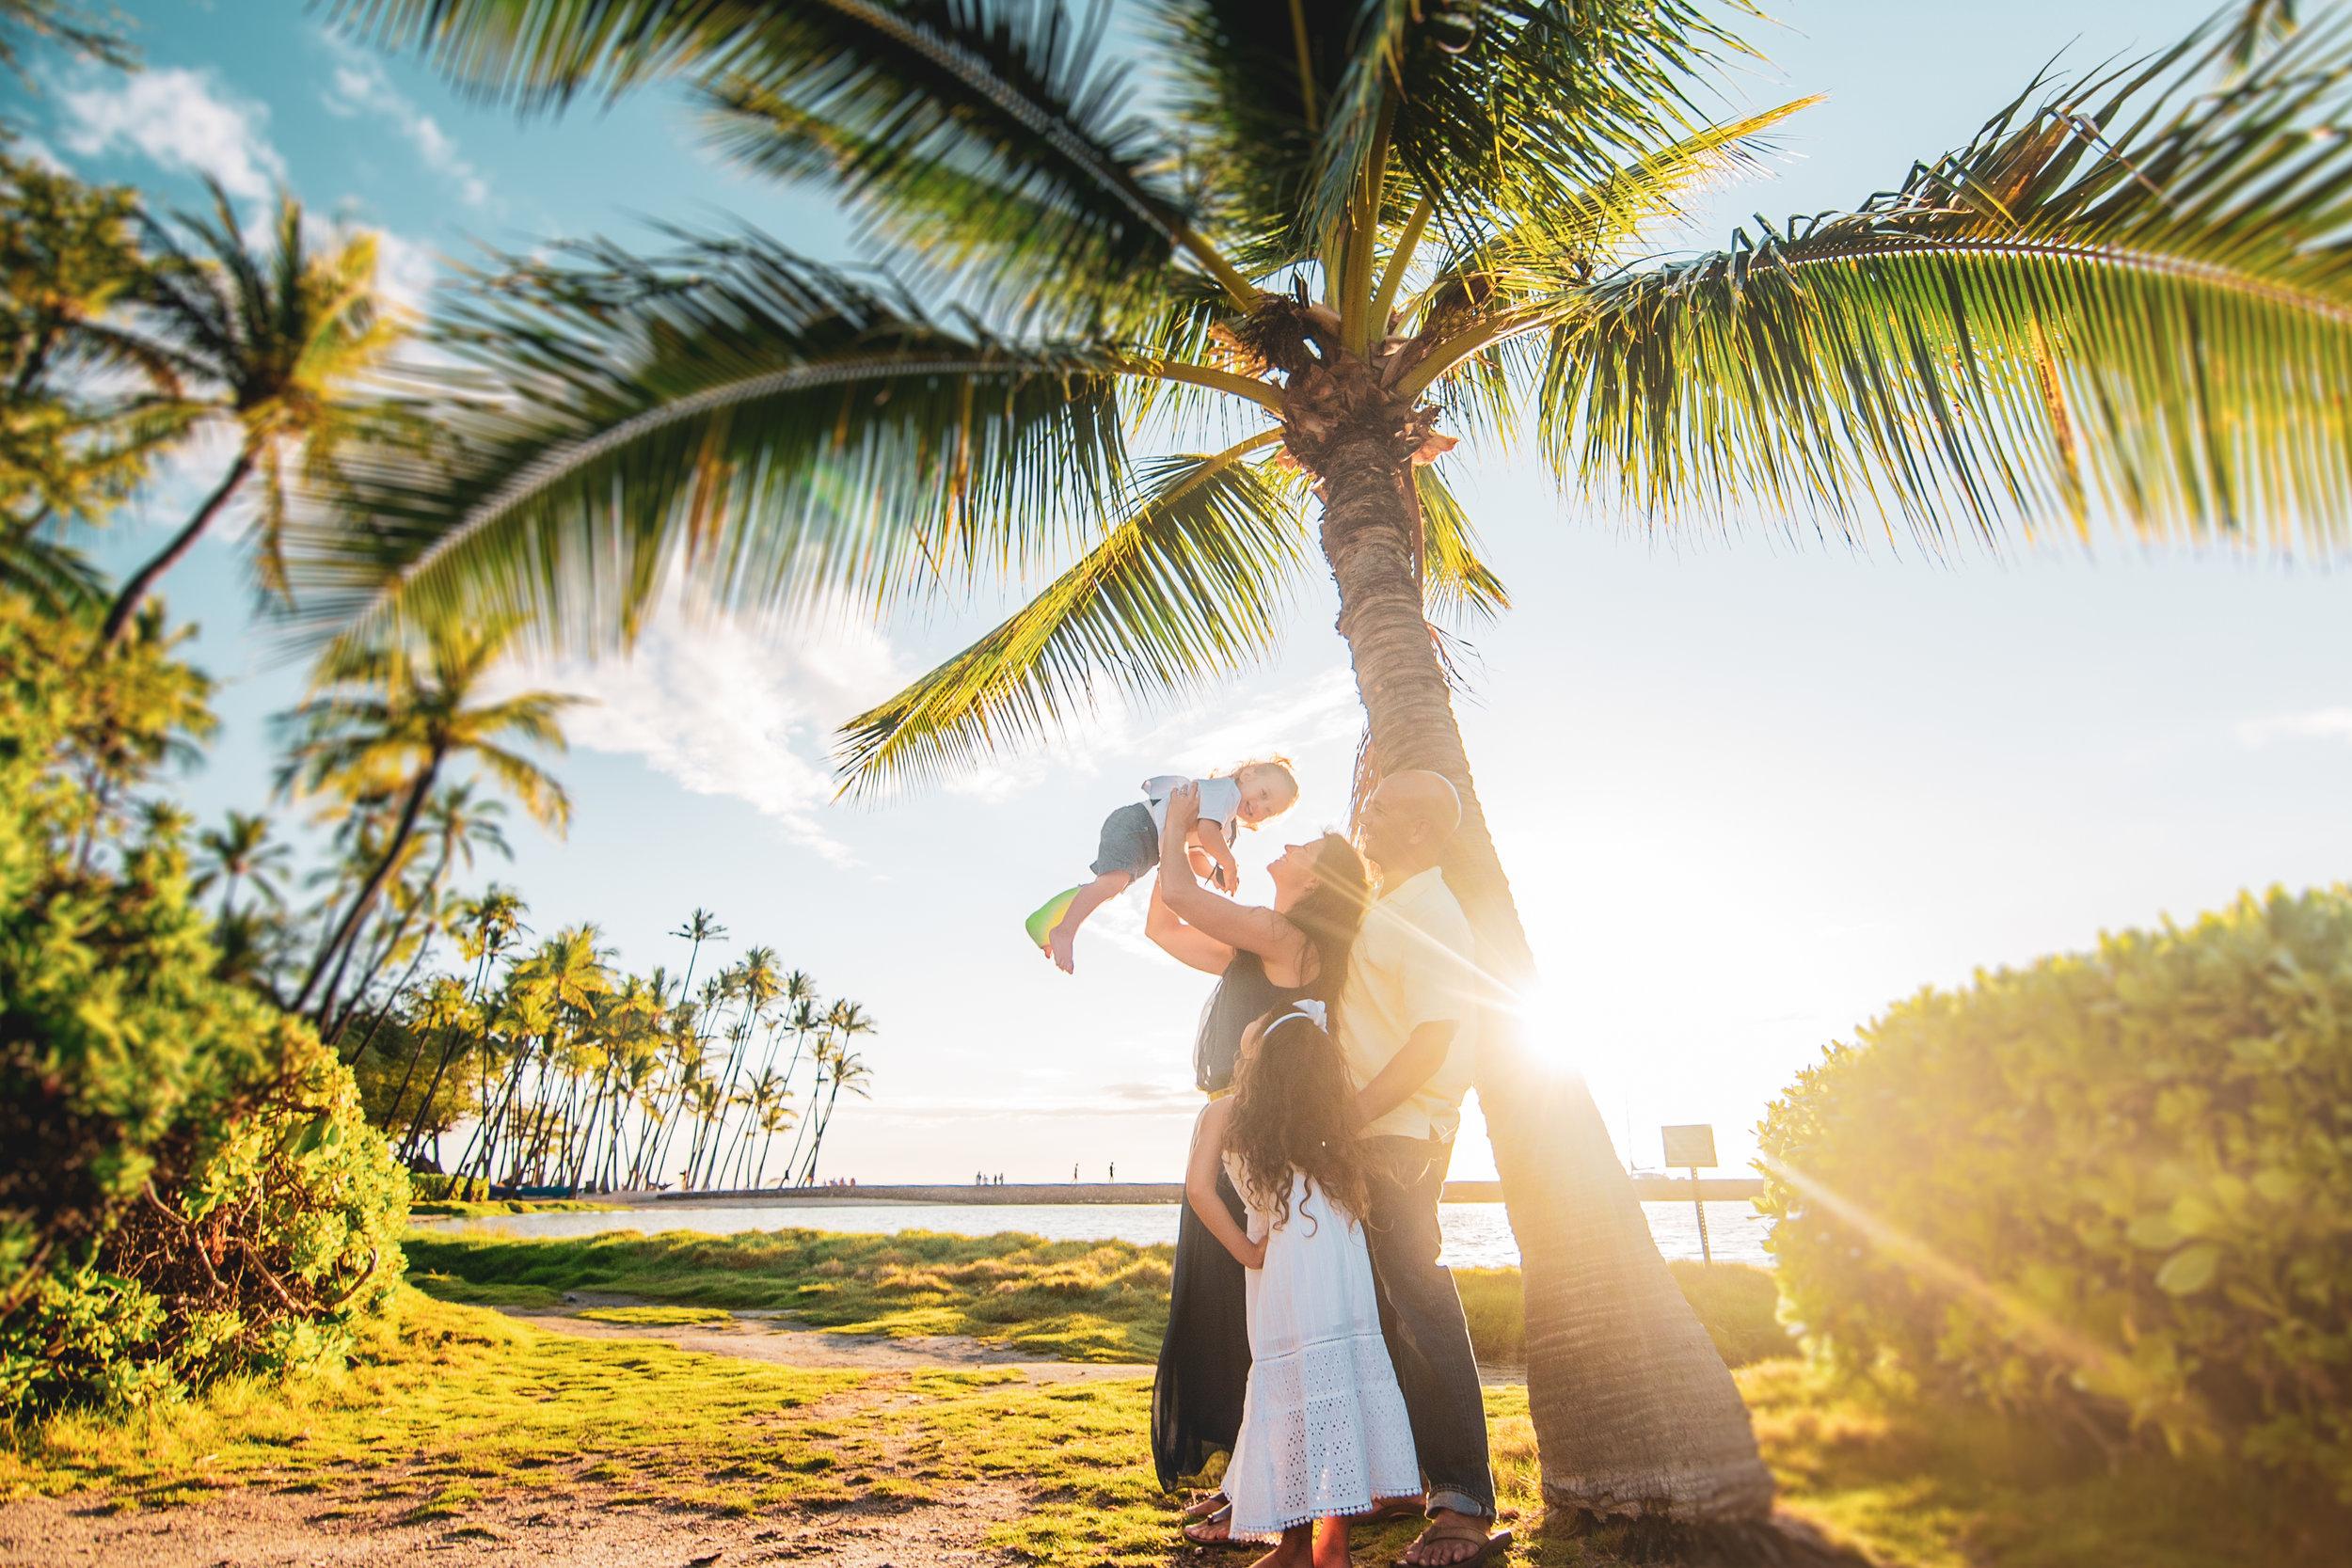 big island hawaii kona lifestyle beach family © kelilina photography 20190609183132.jpg